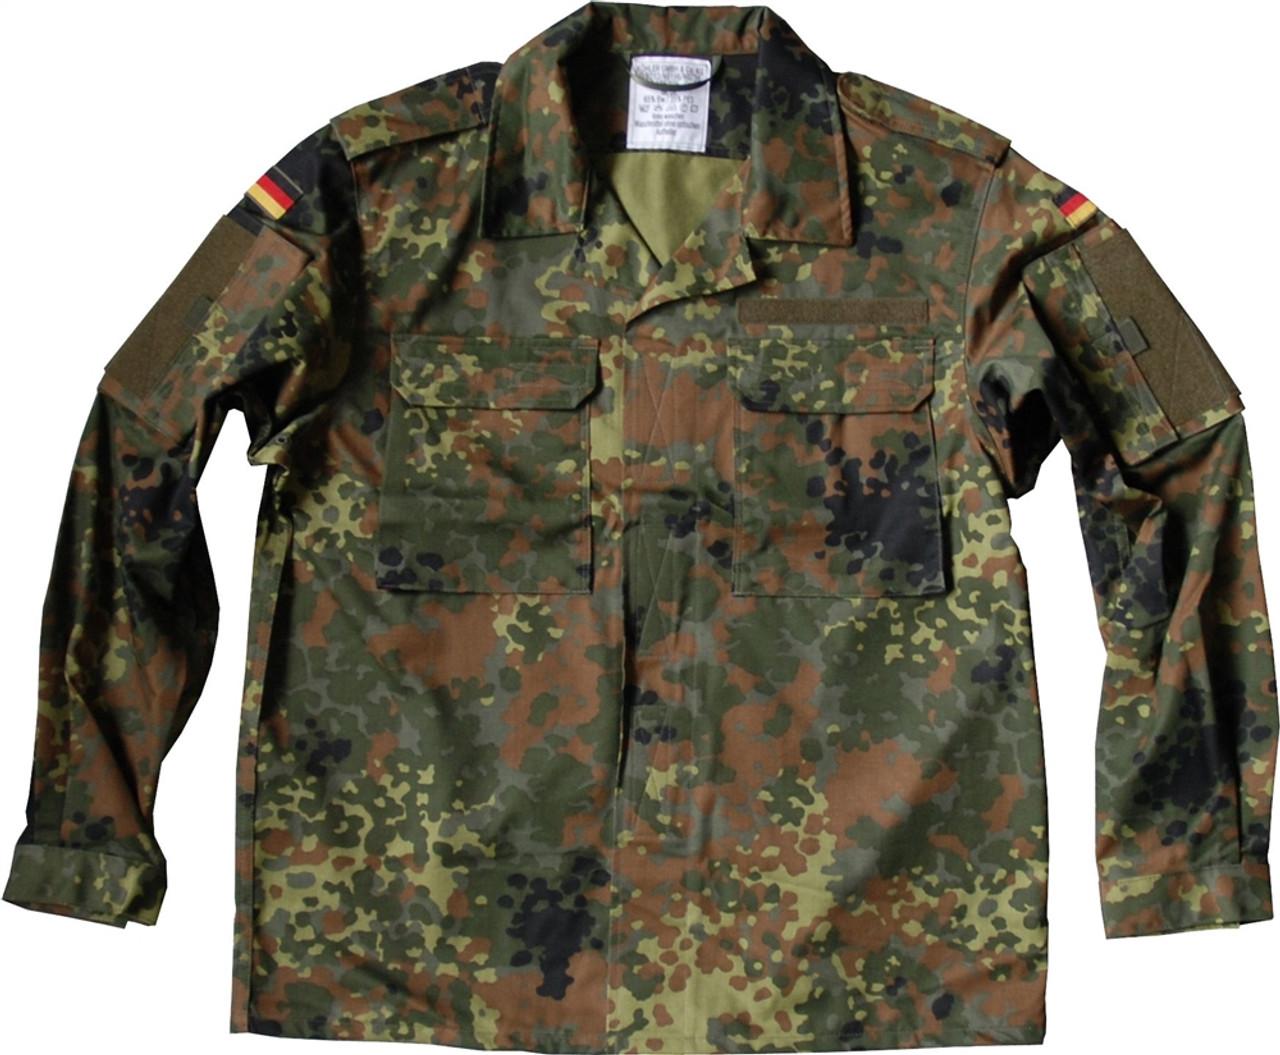 Bw Commando Field Blouse - Flecktarn from Hessen Antique